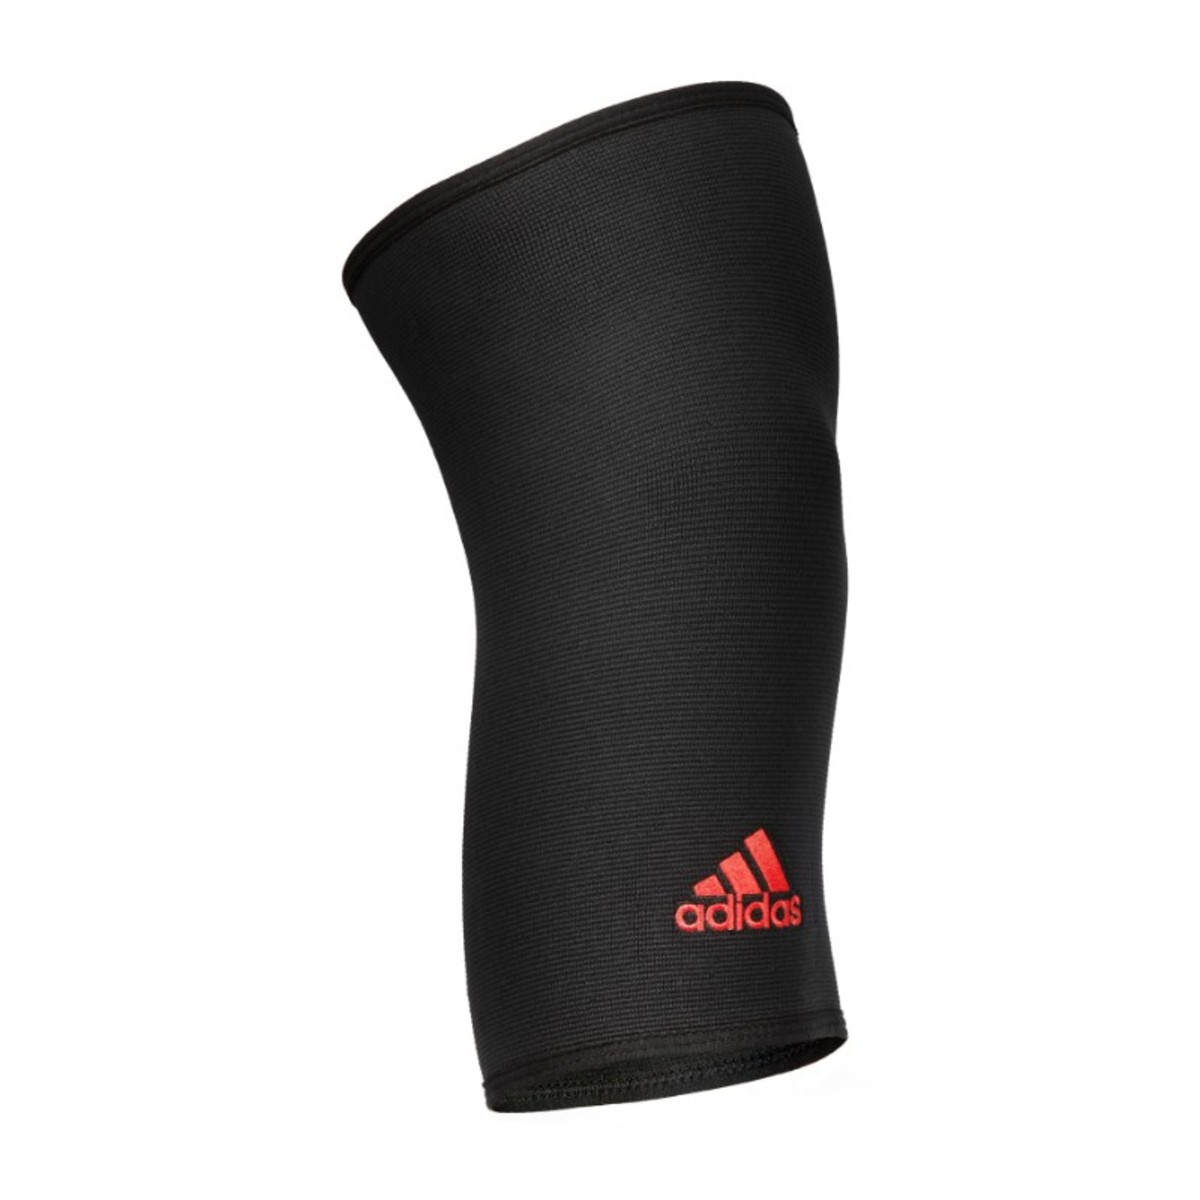 Adidas 護膝(S/M/L/XL)